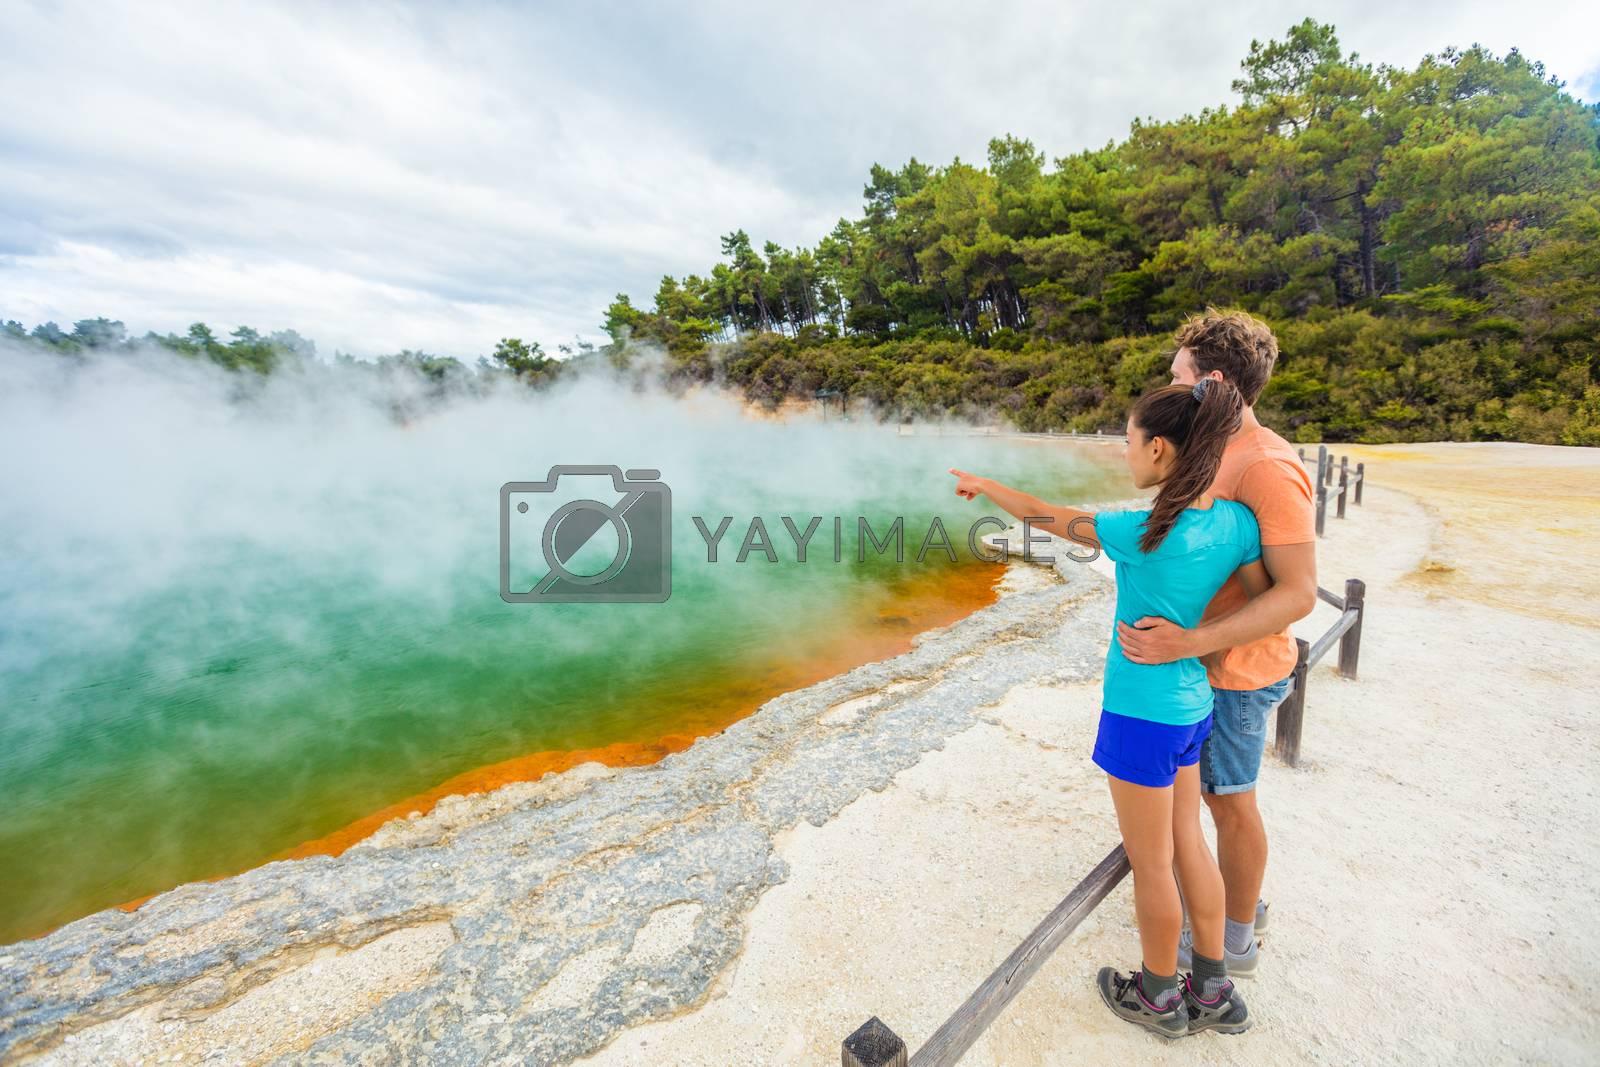 New Zealand travel tourists couple at Champagne pool at Wai-O-Tapu pools Sacred Waters. Tourist attraction in Waiotapu, Rotorua, north island. Active geothermal area, Okataina Volcanic Centre, Taupo.